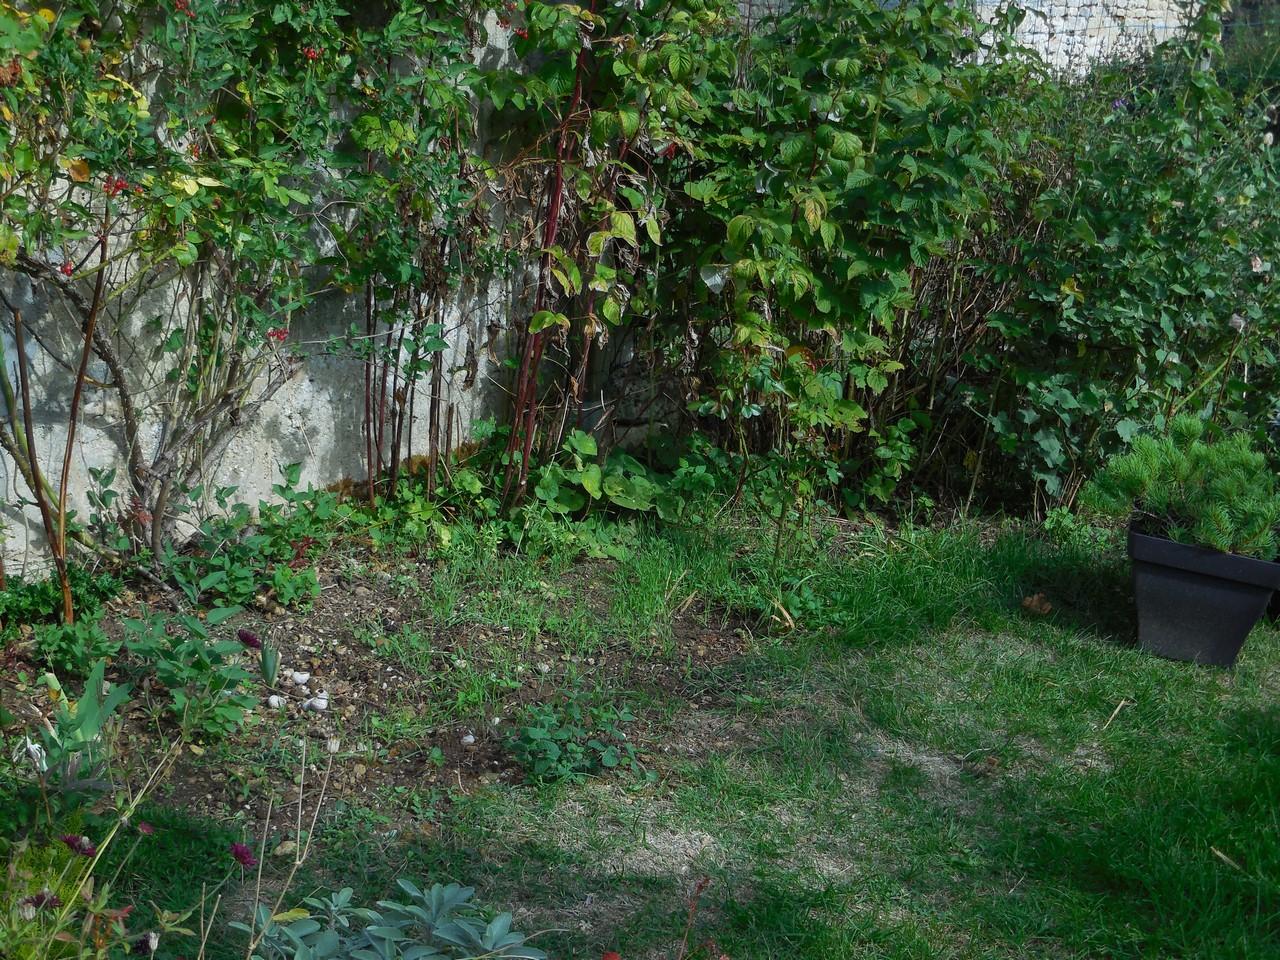 Cagouille 39 s garden botanic la griffe de jardin - Griffe de jardin ...